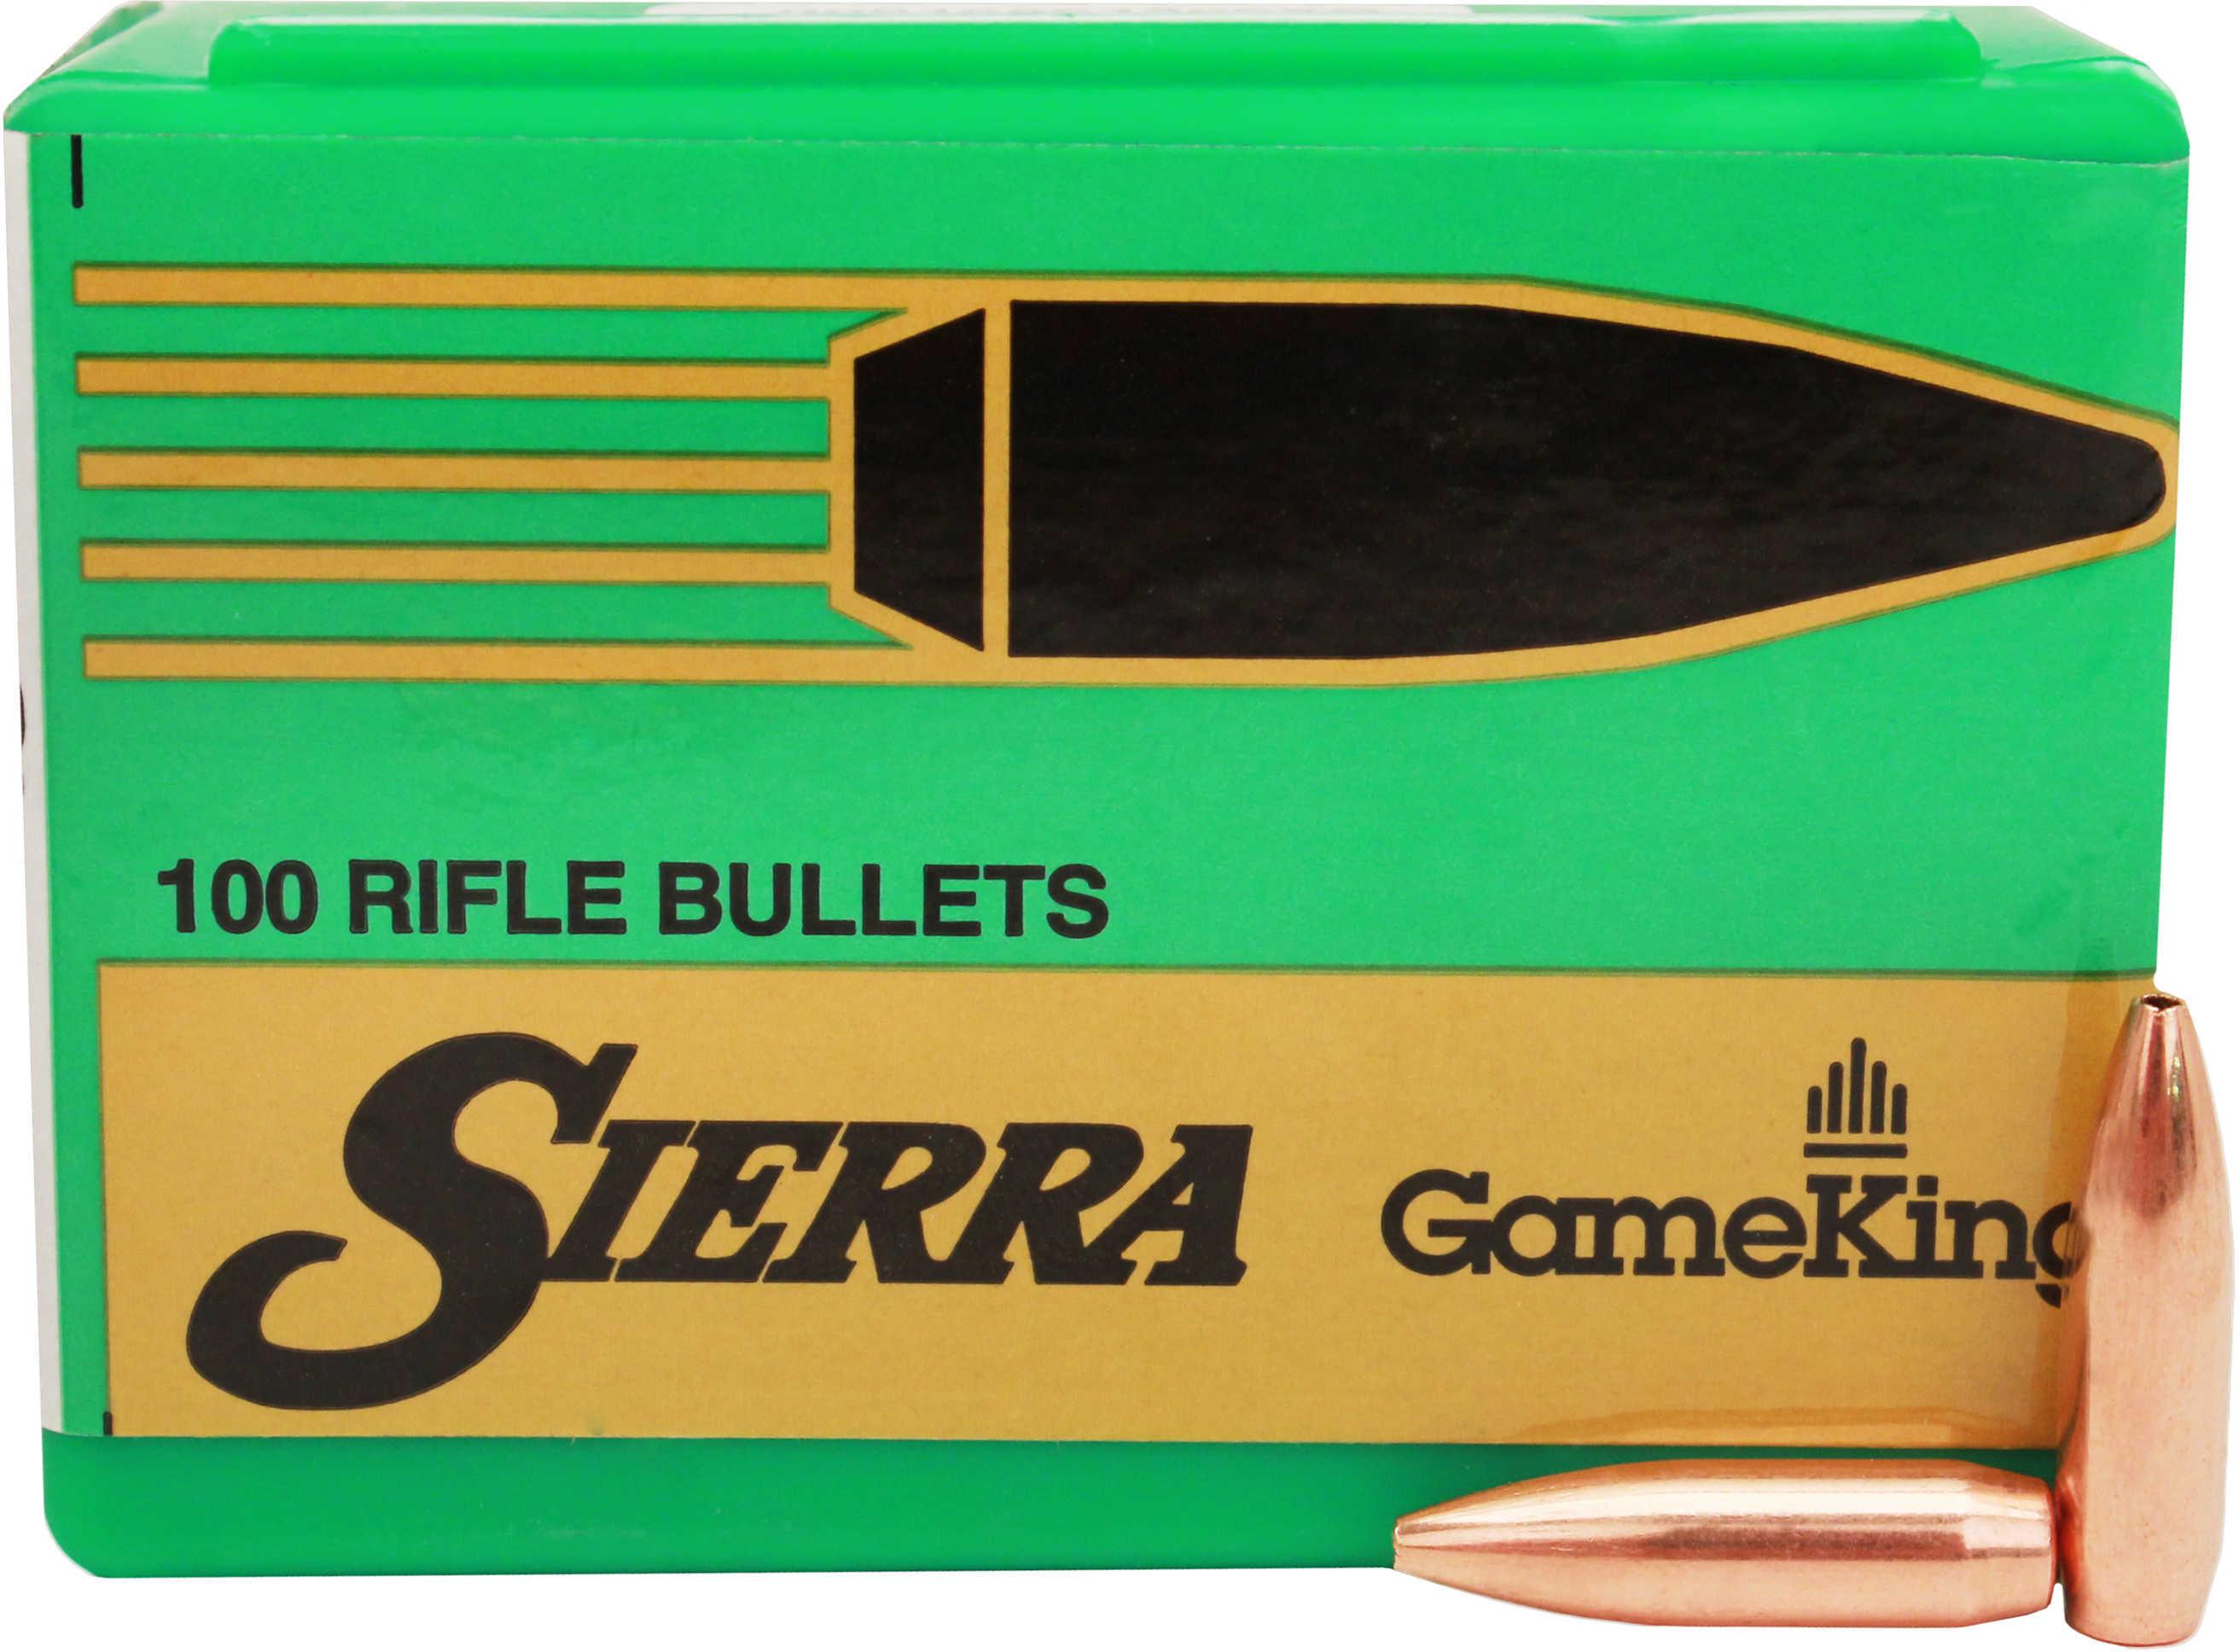 Sierra Gameking 6MM/243 Caliber 85 Grain Boat Tail Hollow Point 100/Box Md: 1530 Bullets